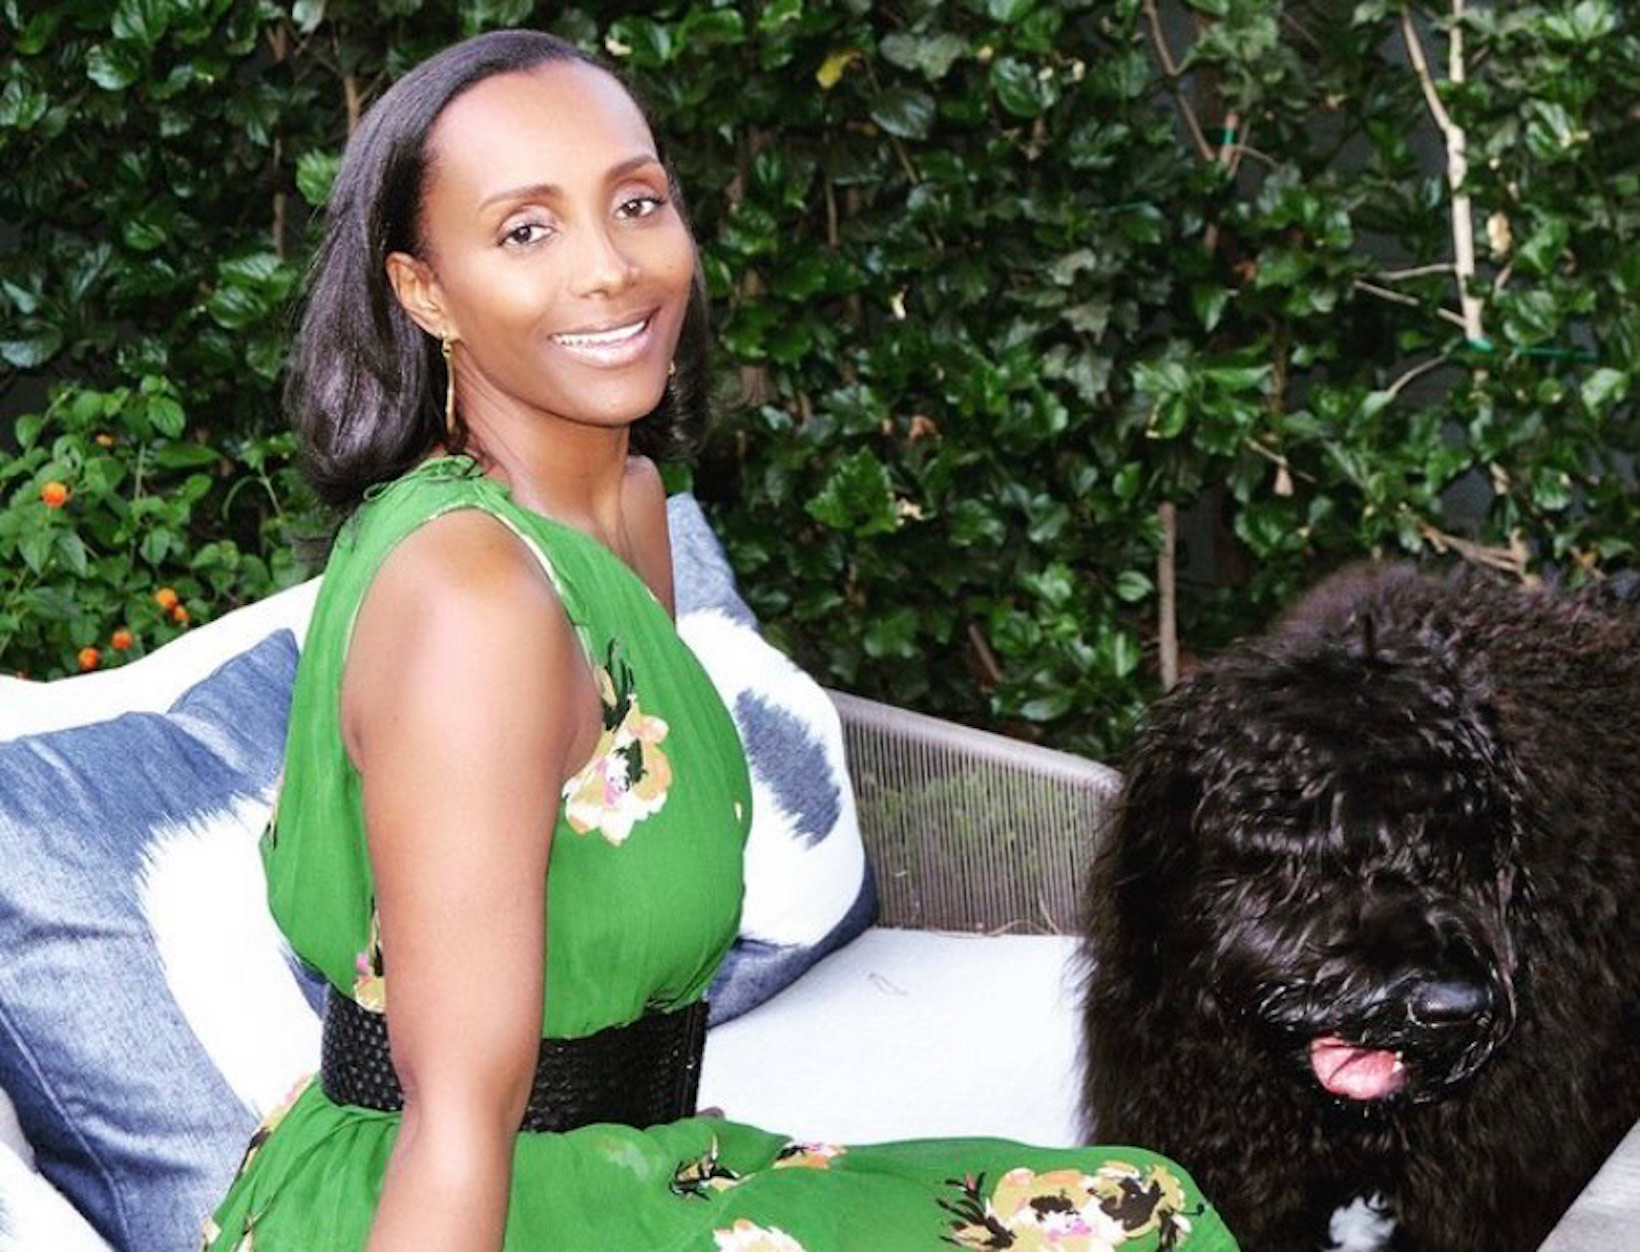 Katonya Breaux with her dog